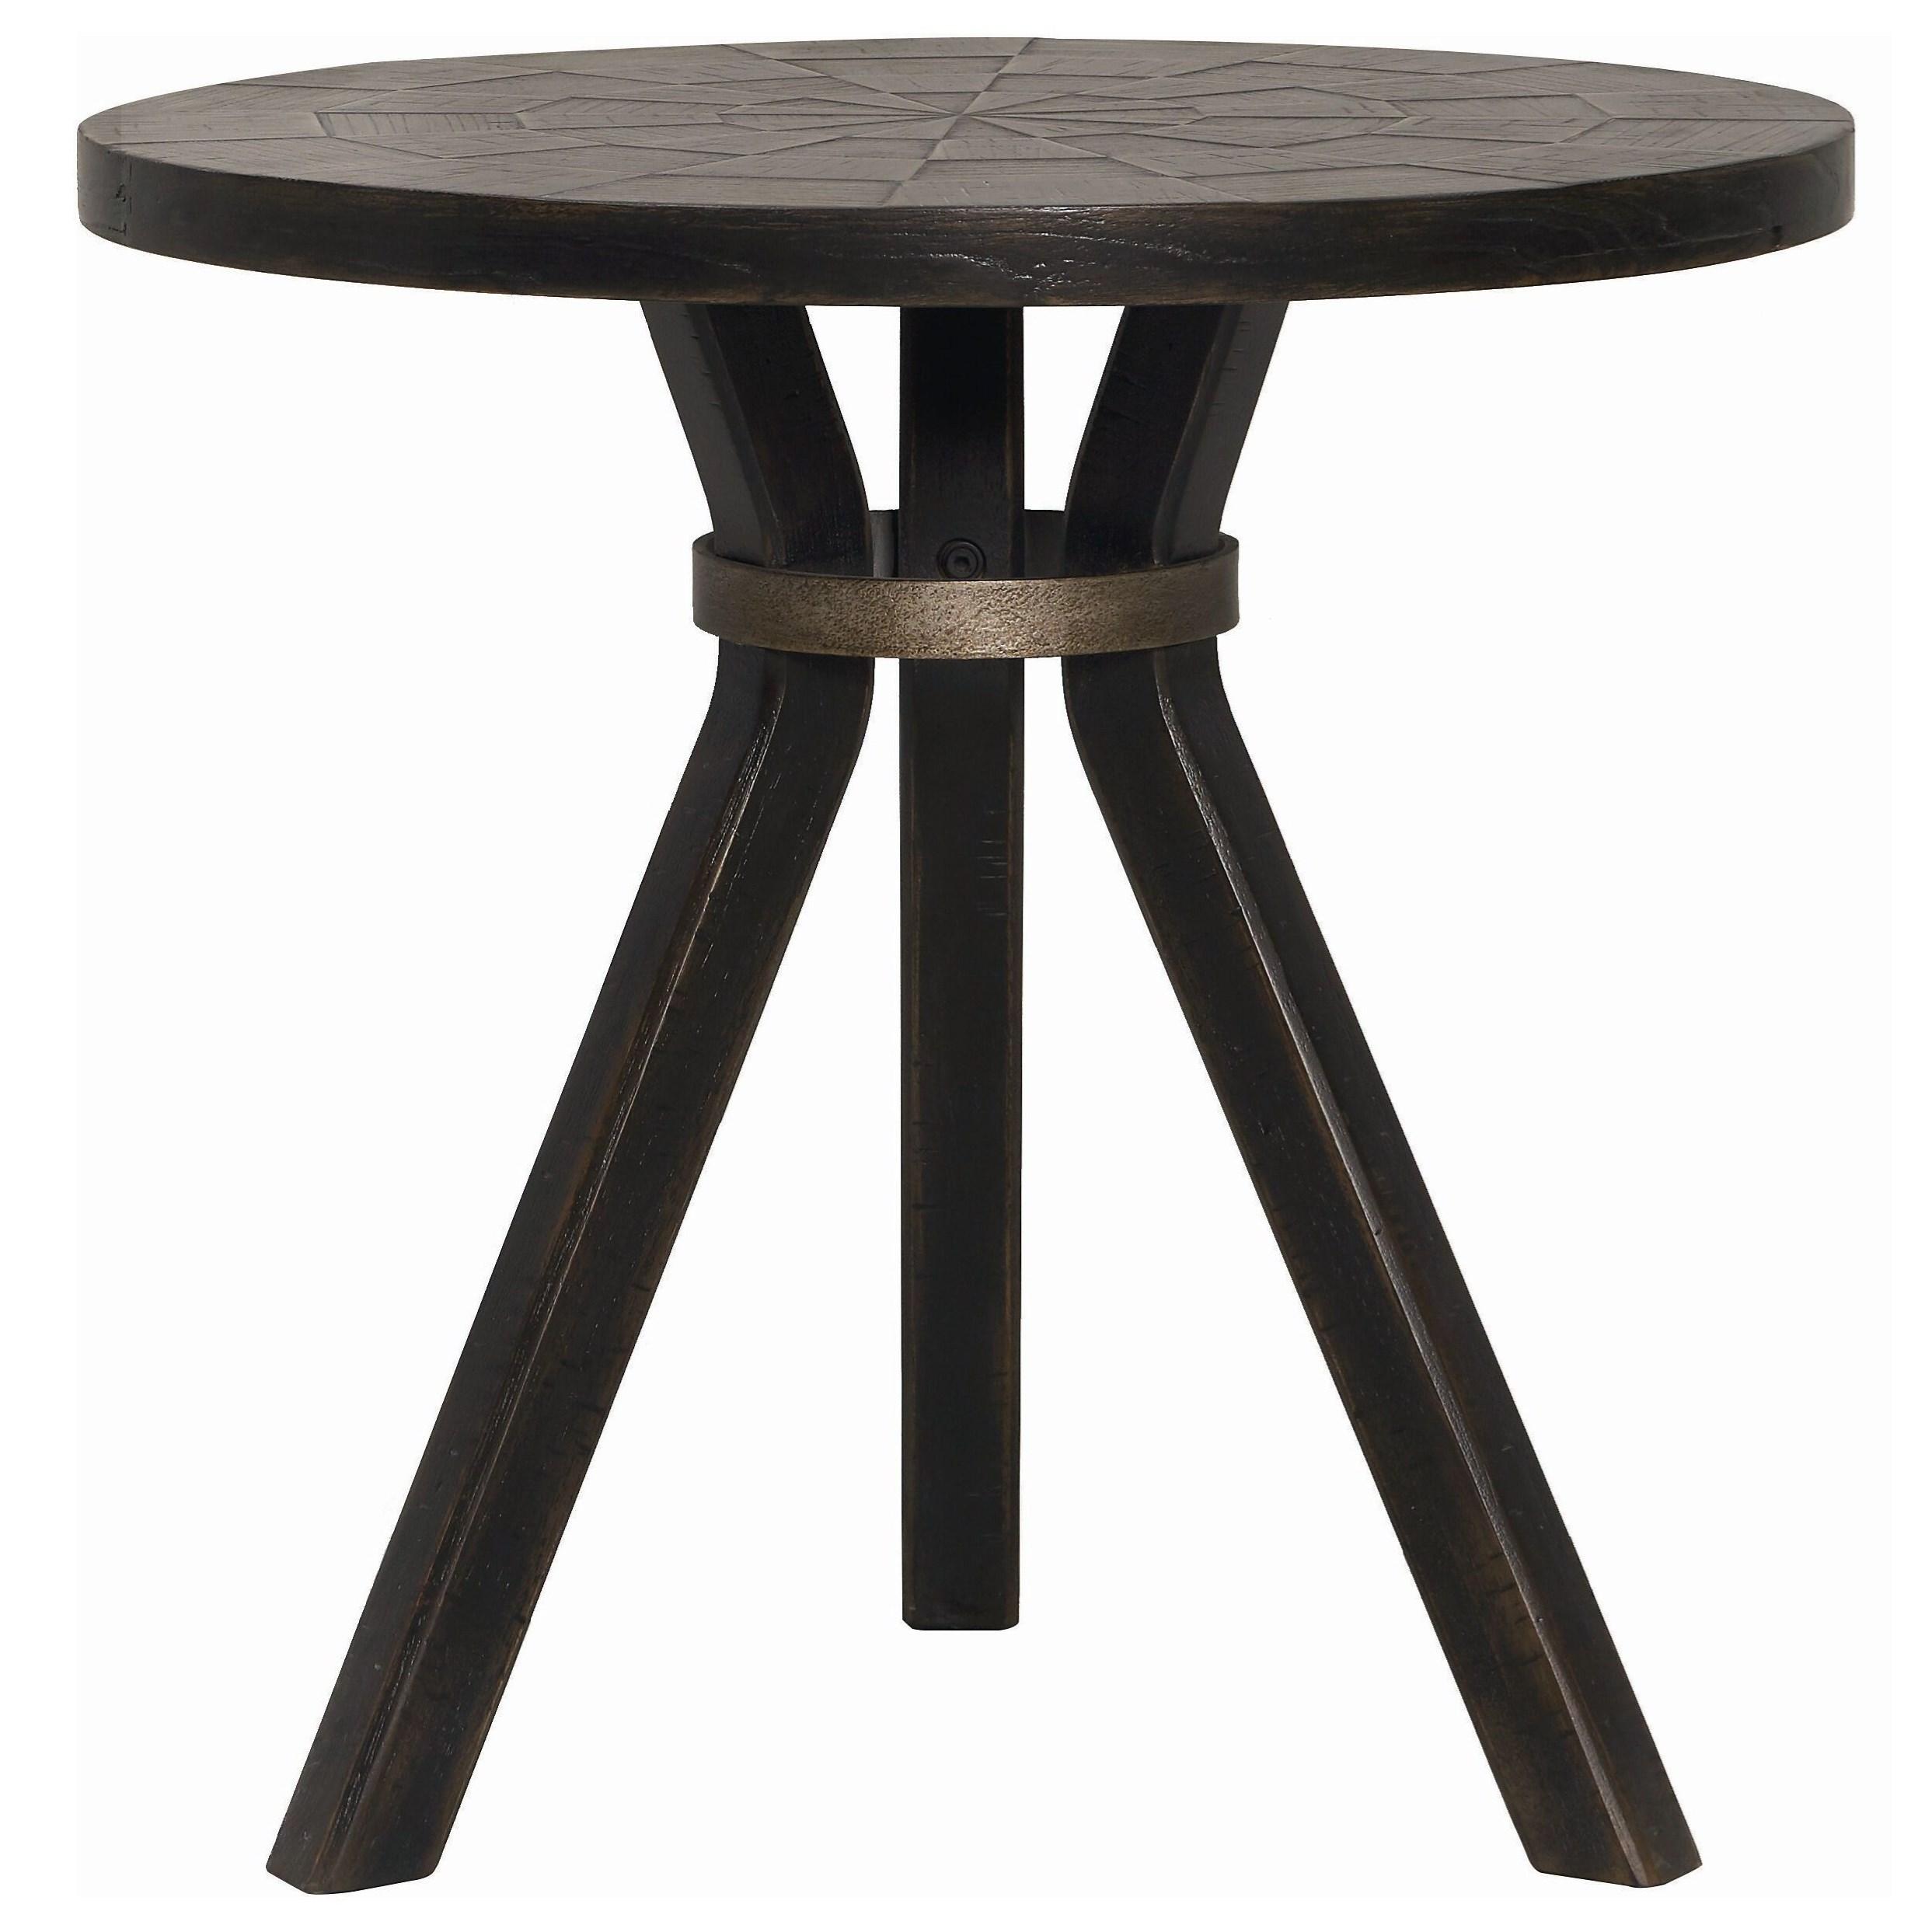 Woodridge Round Drink Table by Bassett at Bassett of Cool Springs